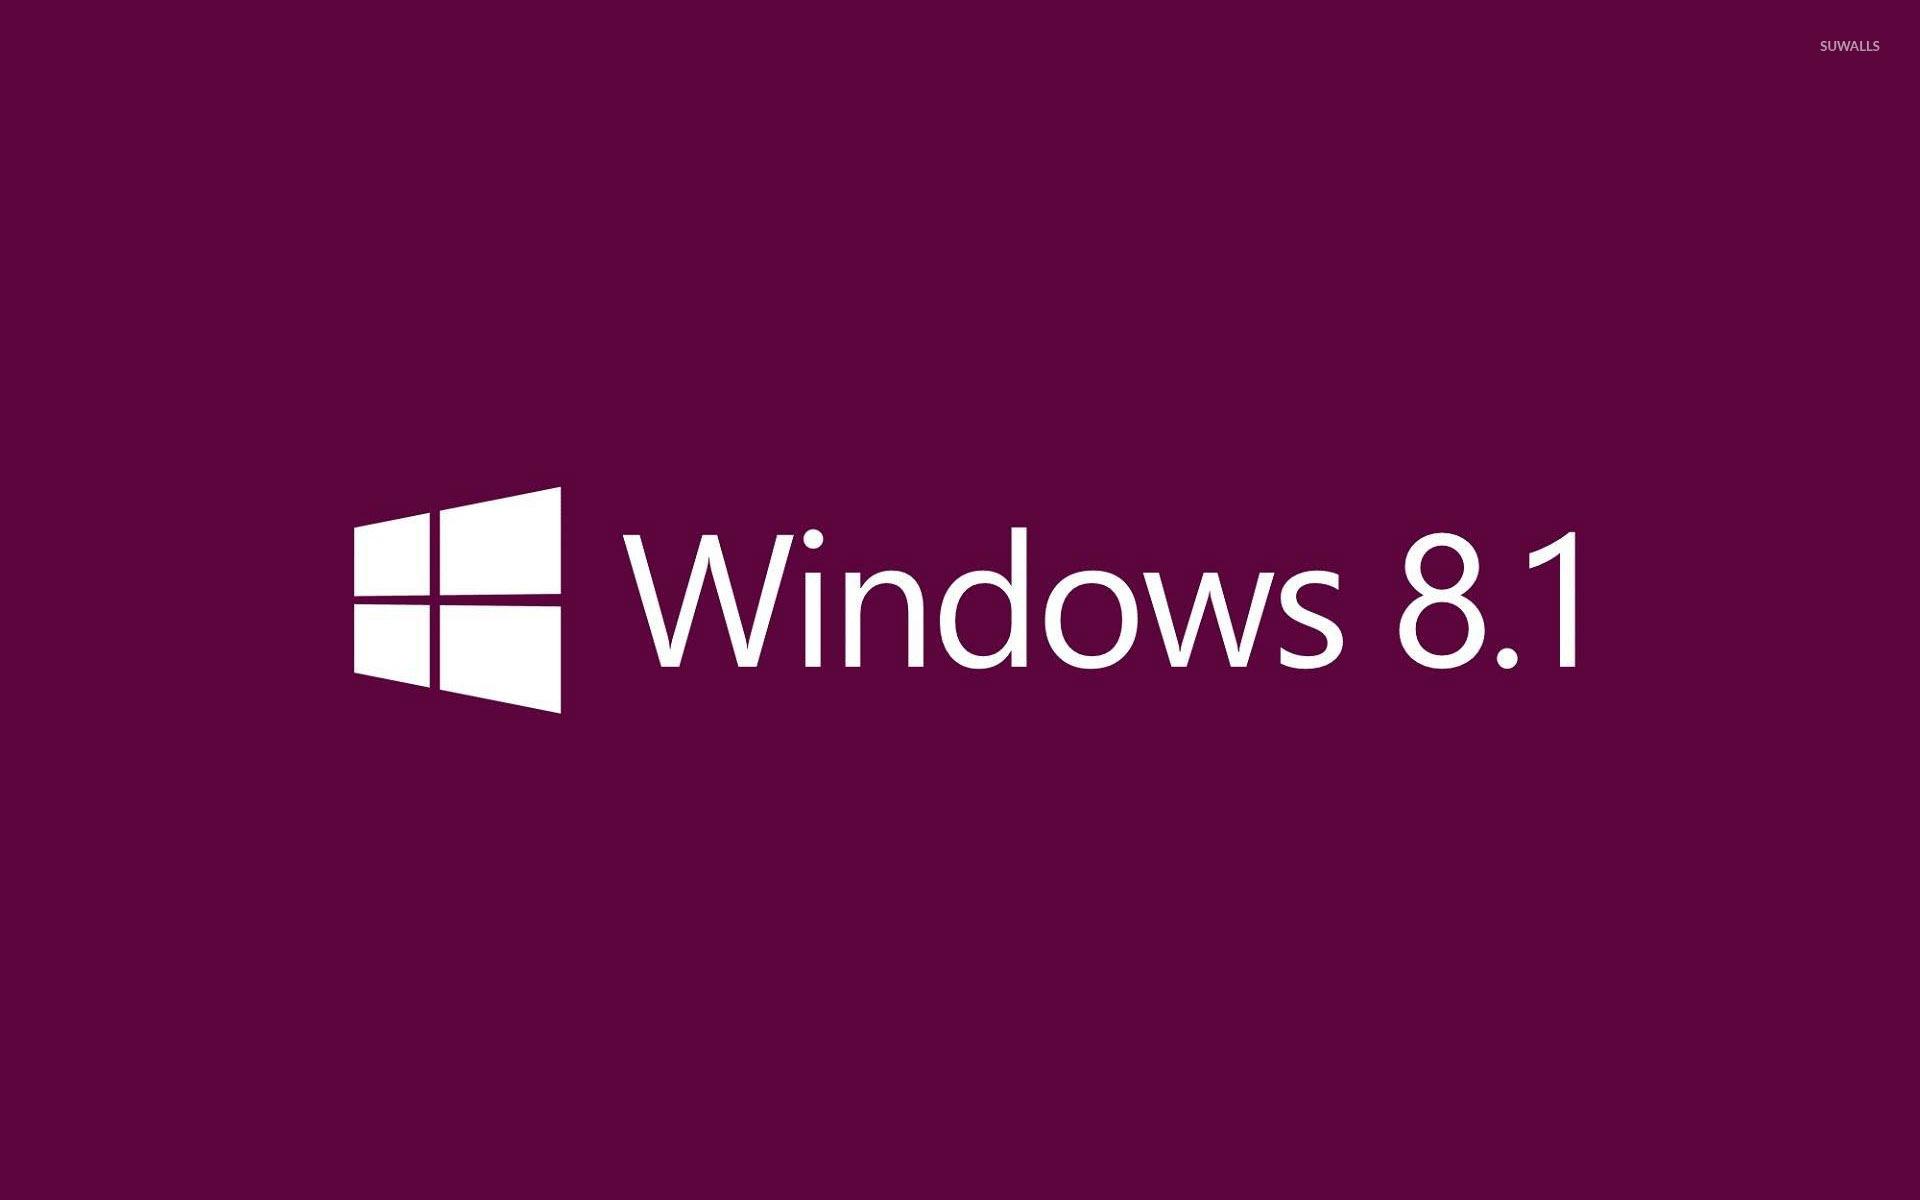 Windows 81 6 Wallpaper Computer Wallpapers 27797